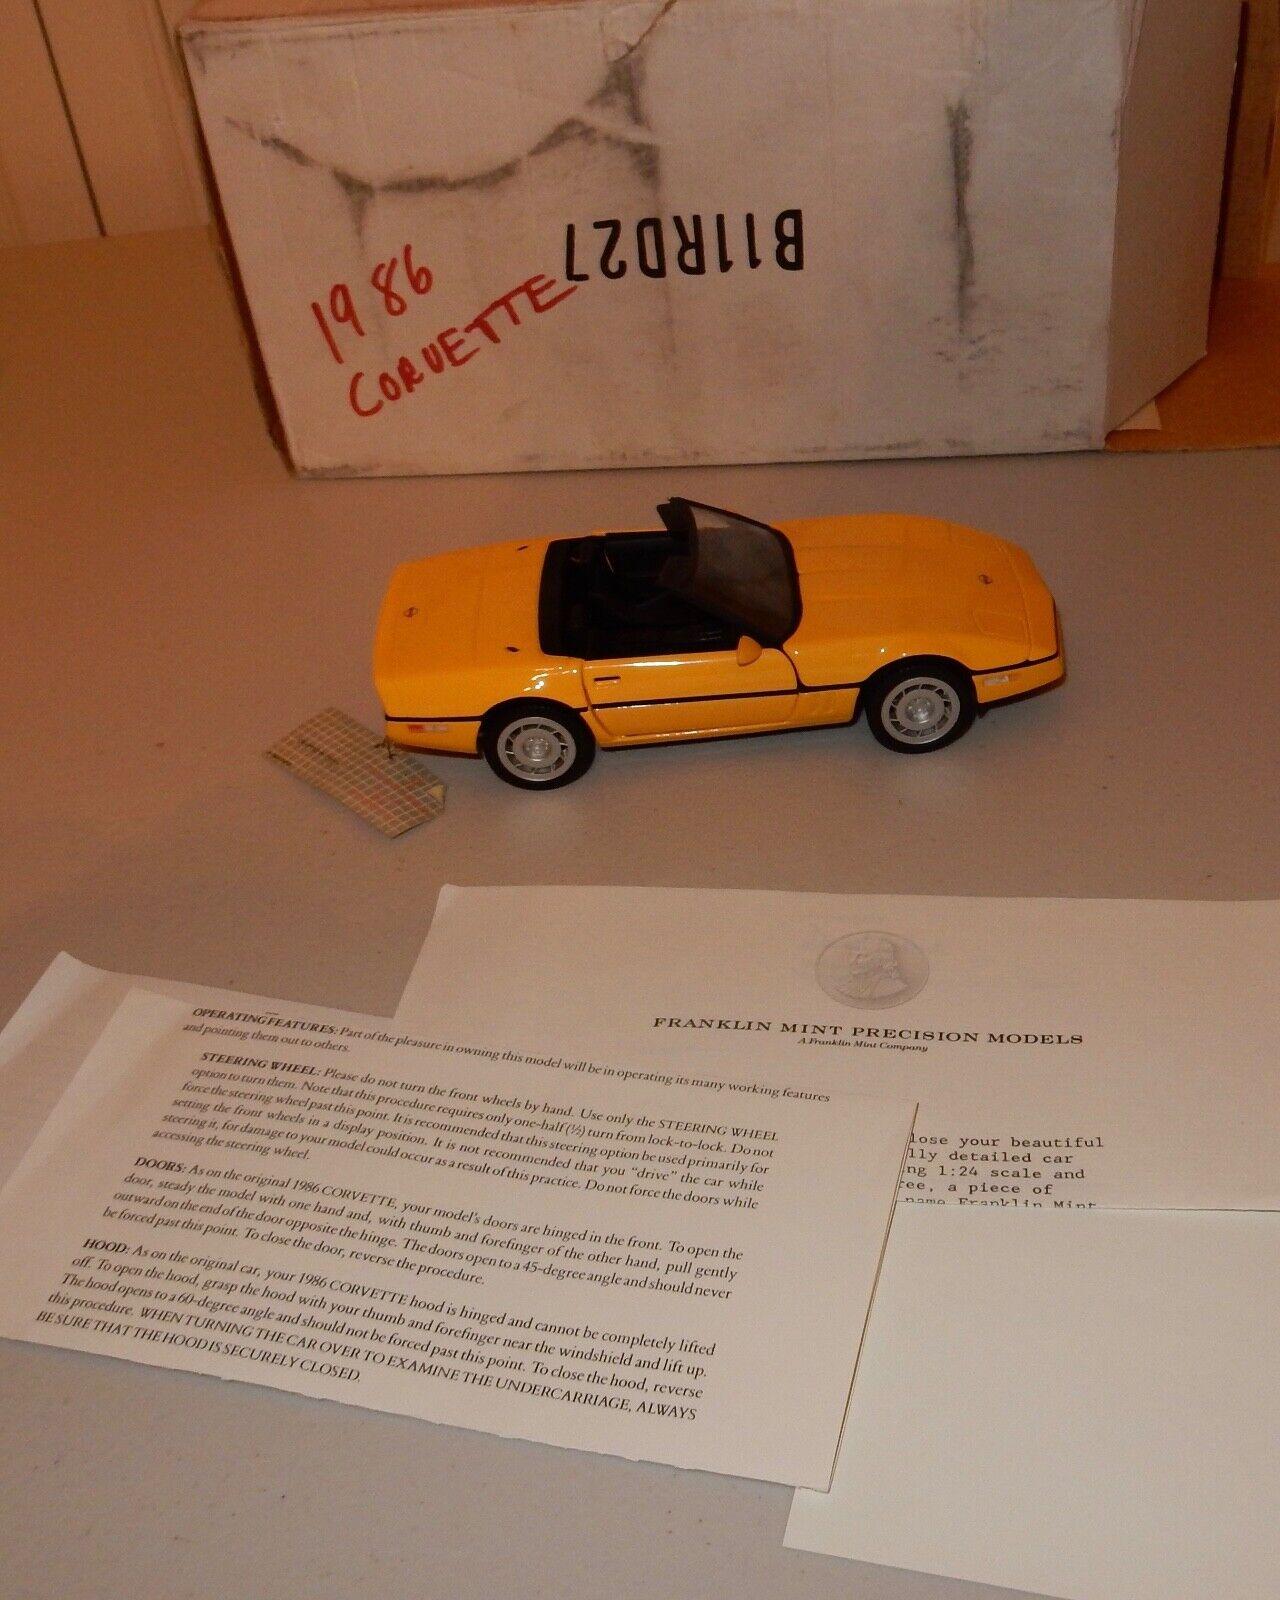 Franklin Mint 1986 Gelb Chevrolet Corvette ConGrünible Undisplayed